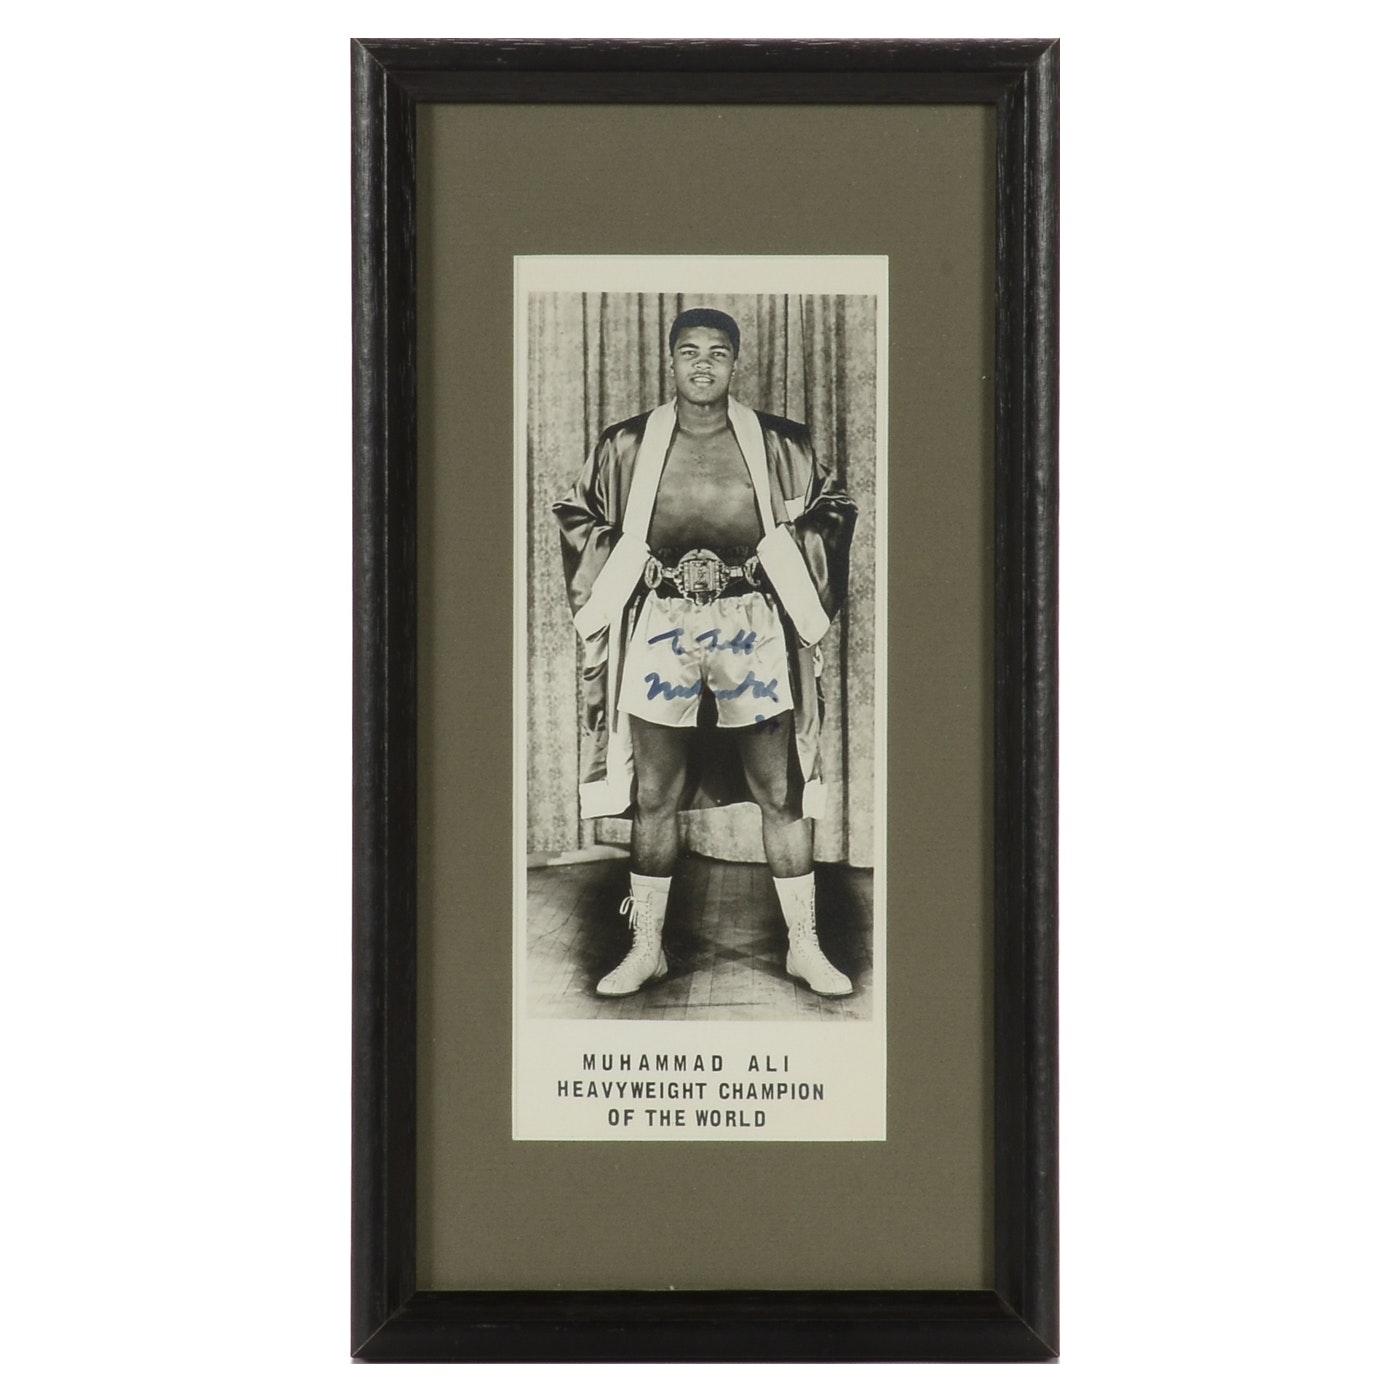 Muhammad Ali Signed Boxing Framed Photo Print